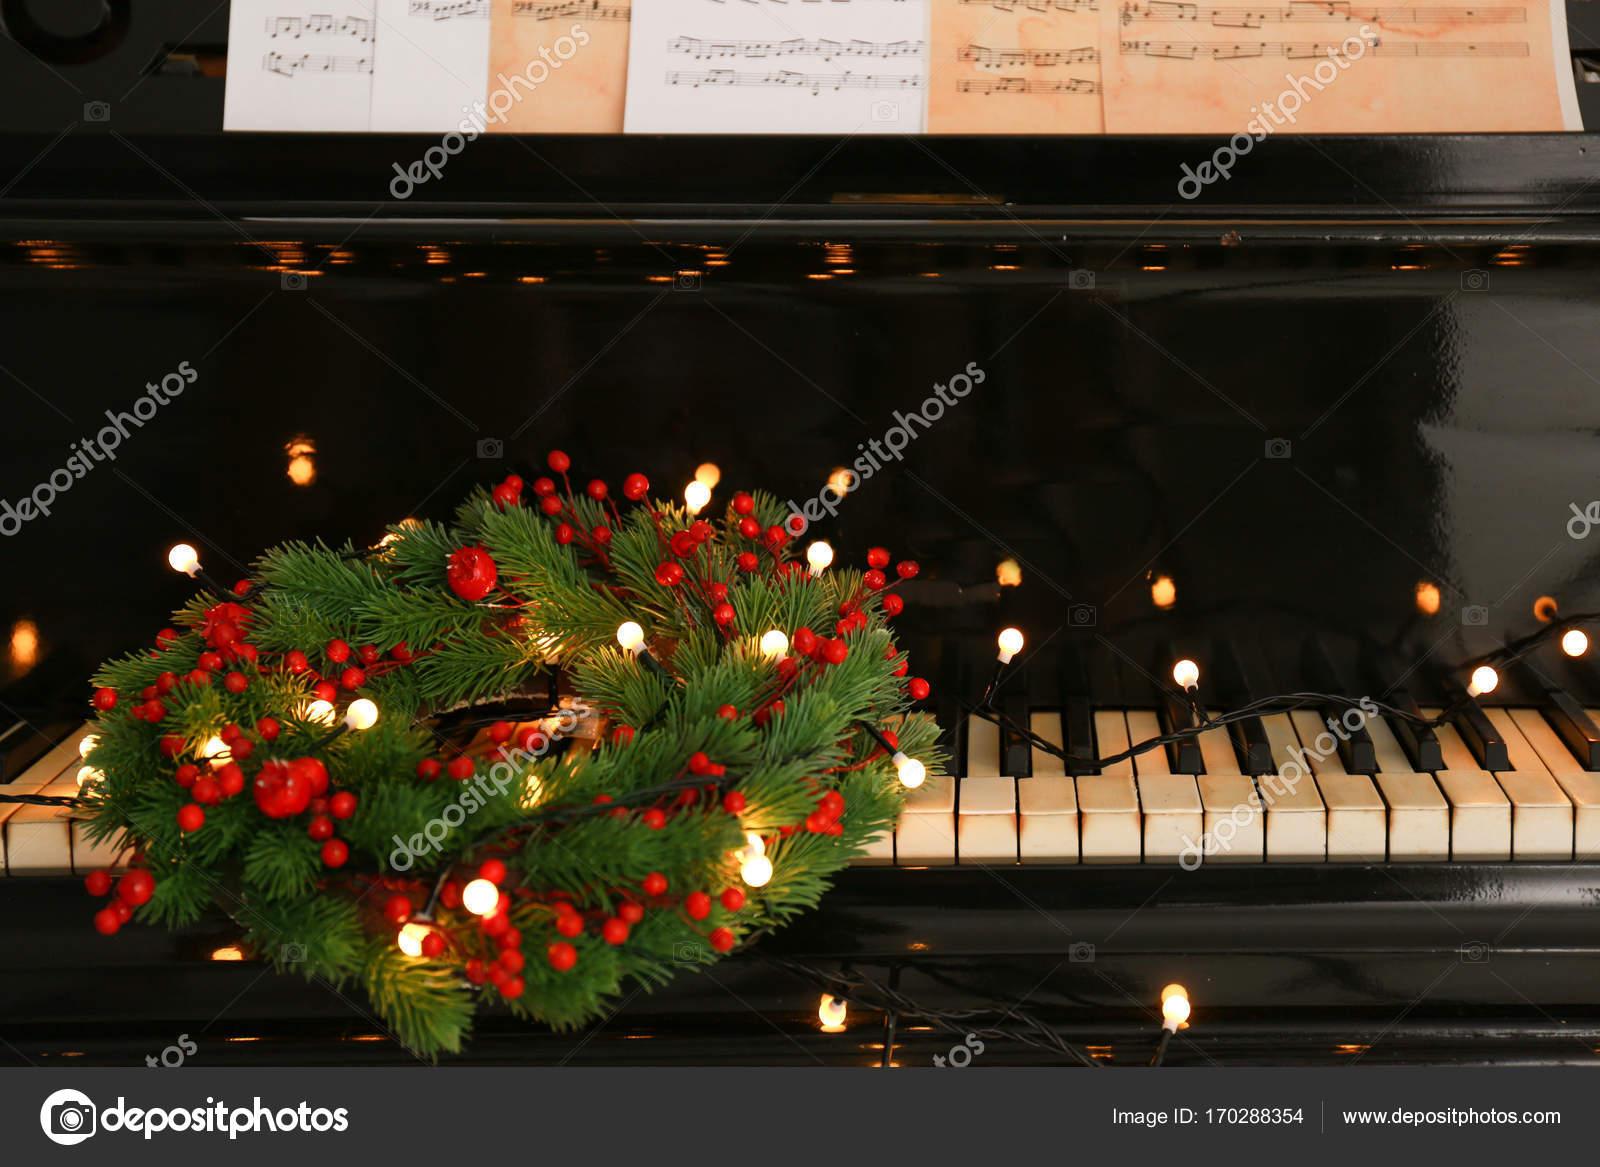 https://st3.depositphotos.com/1177973/17028/i/1600/depositphotos_170288354-stockafbeelding-piano-klavier-met-kerst-krans.jpg